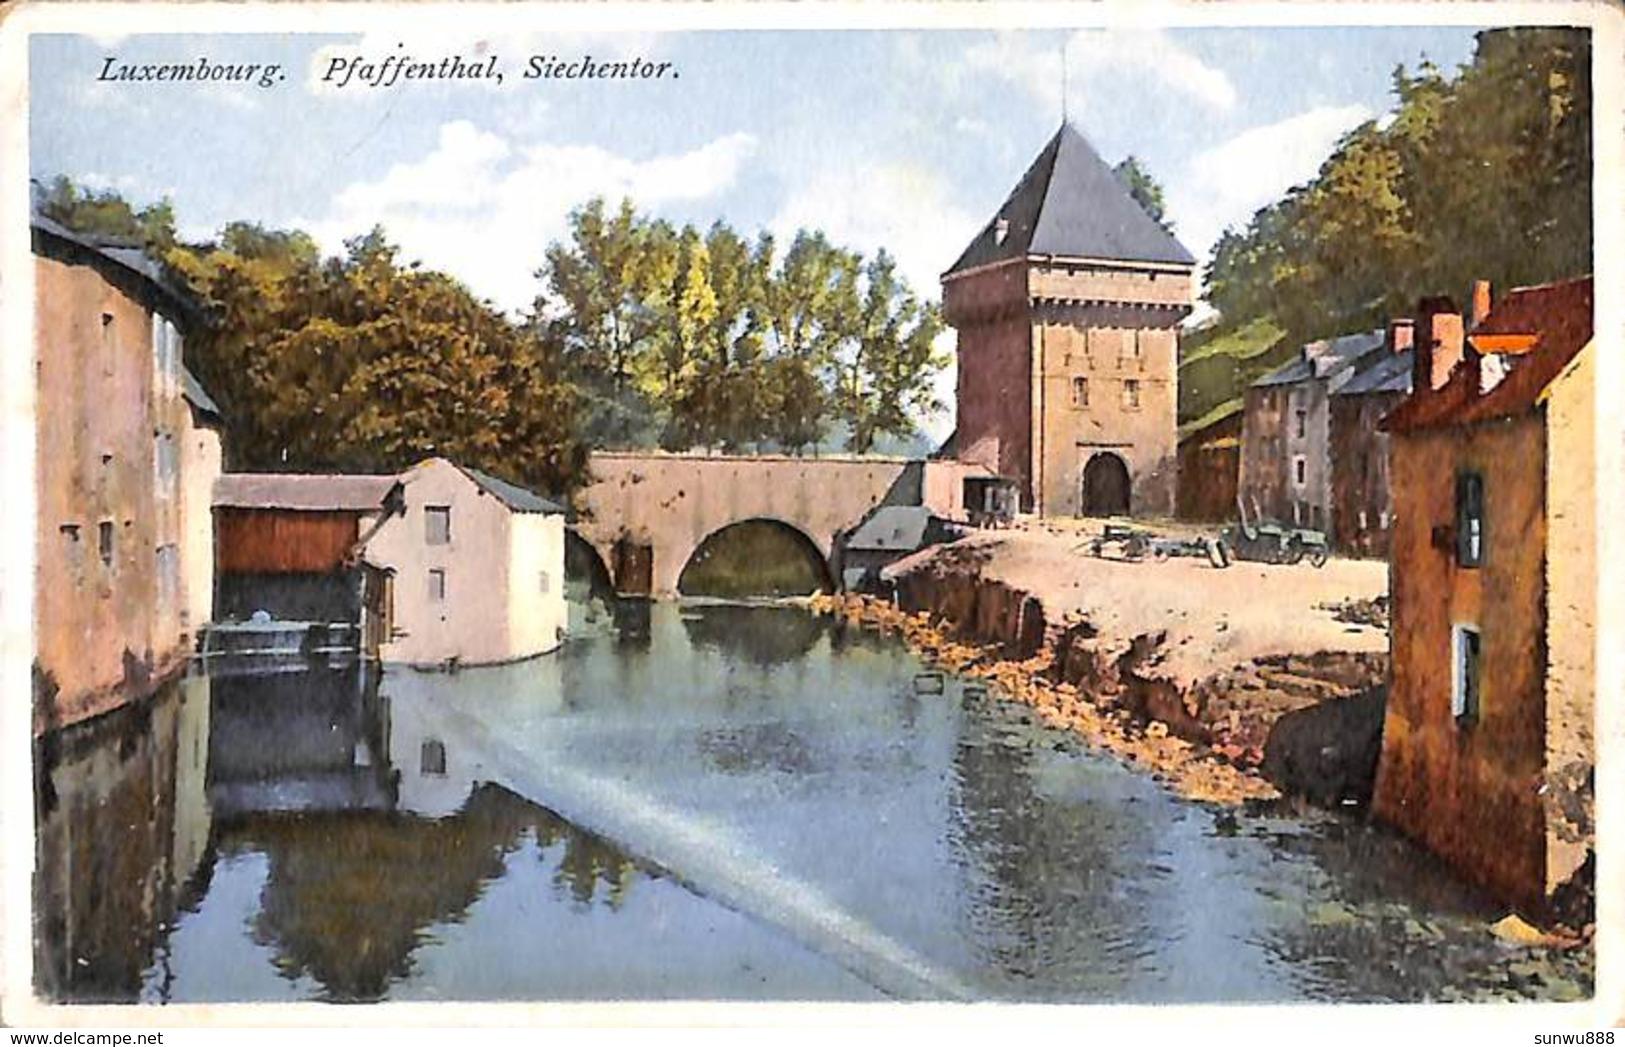 Luxemburg - Pfaffenthal, Siechentor (colorisée) - Luxemburg - Stad